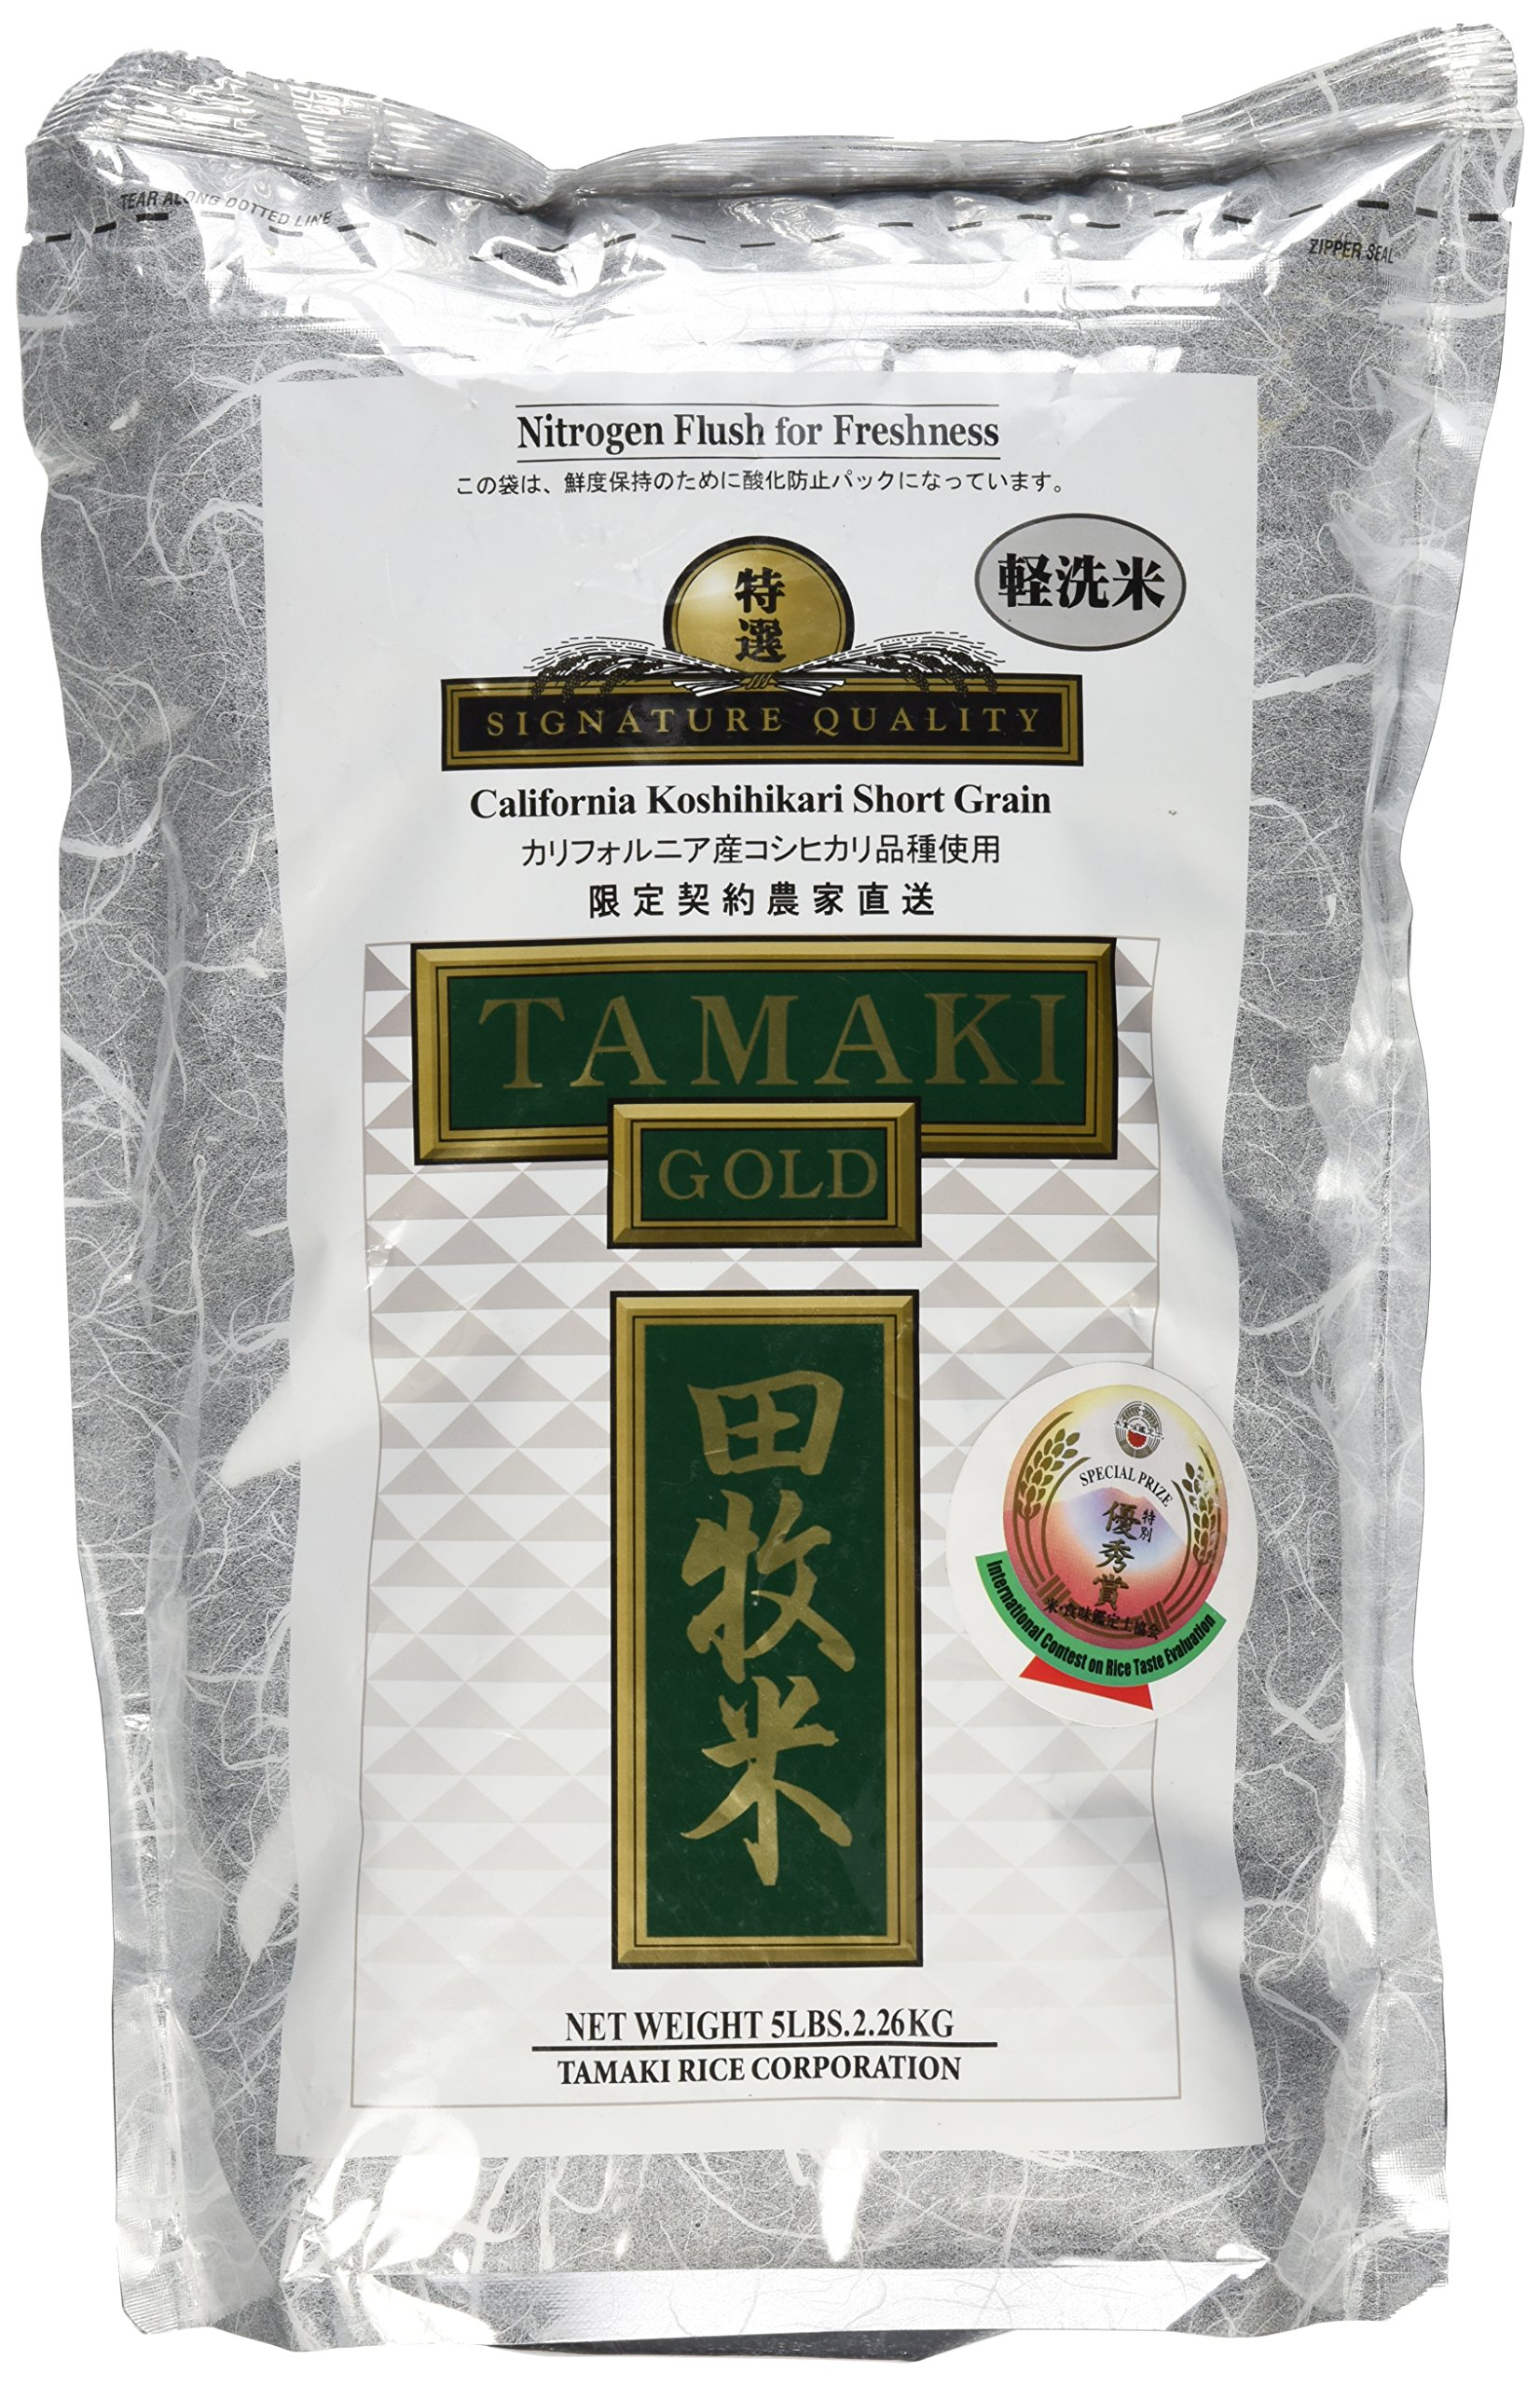 Tamaki Gold - Signature Quality California Koshihikari Short Grain Rice (4.4 lb Bag)